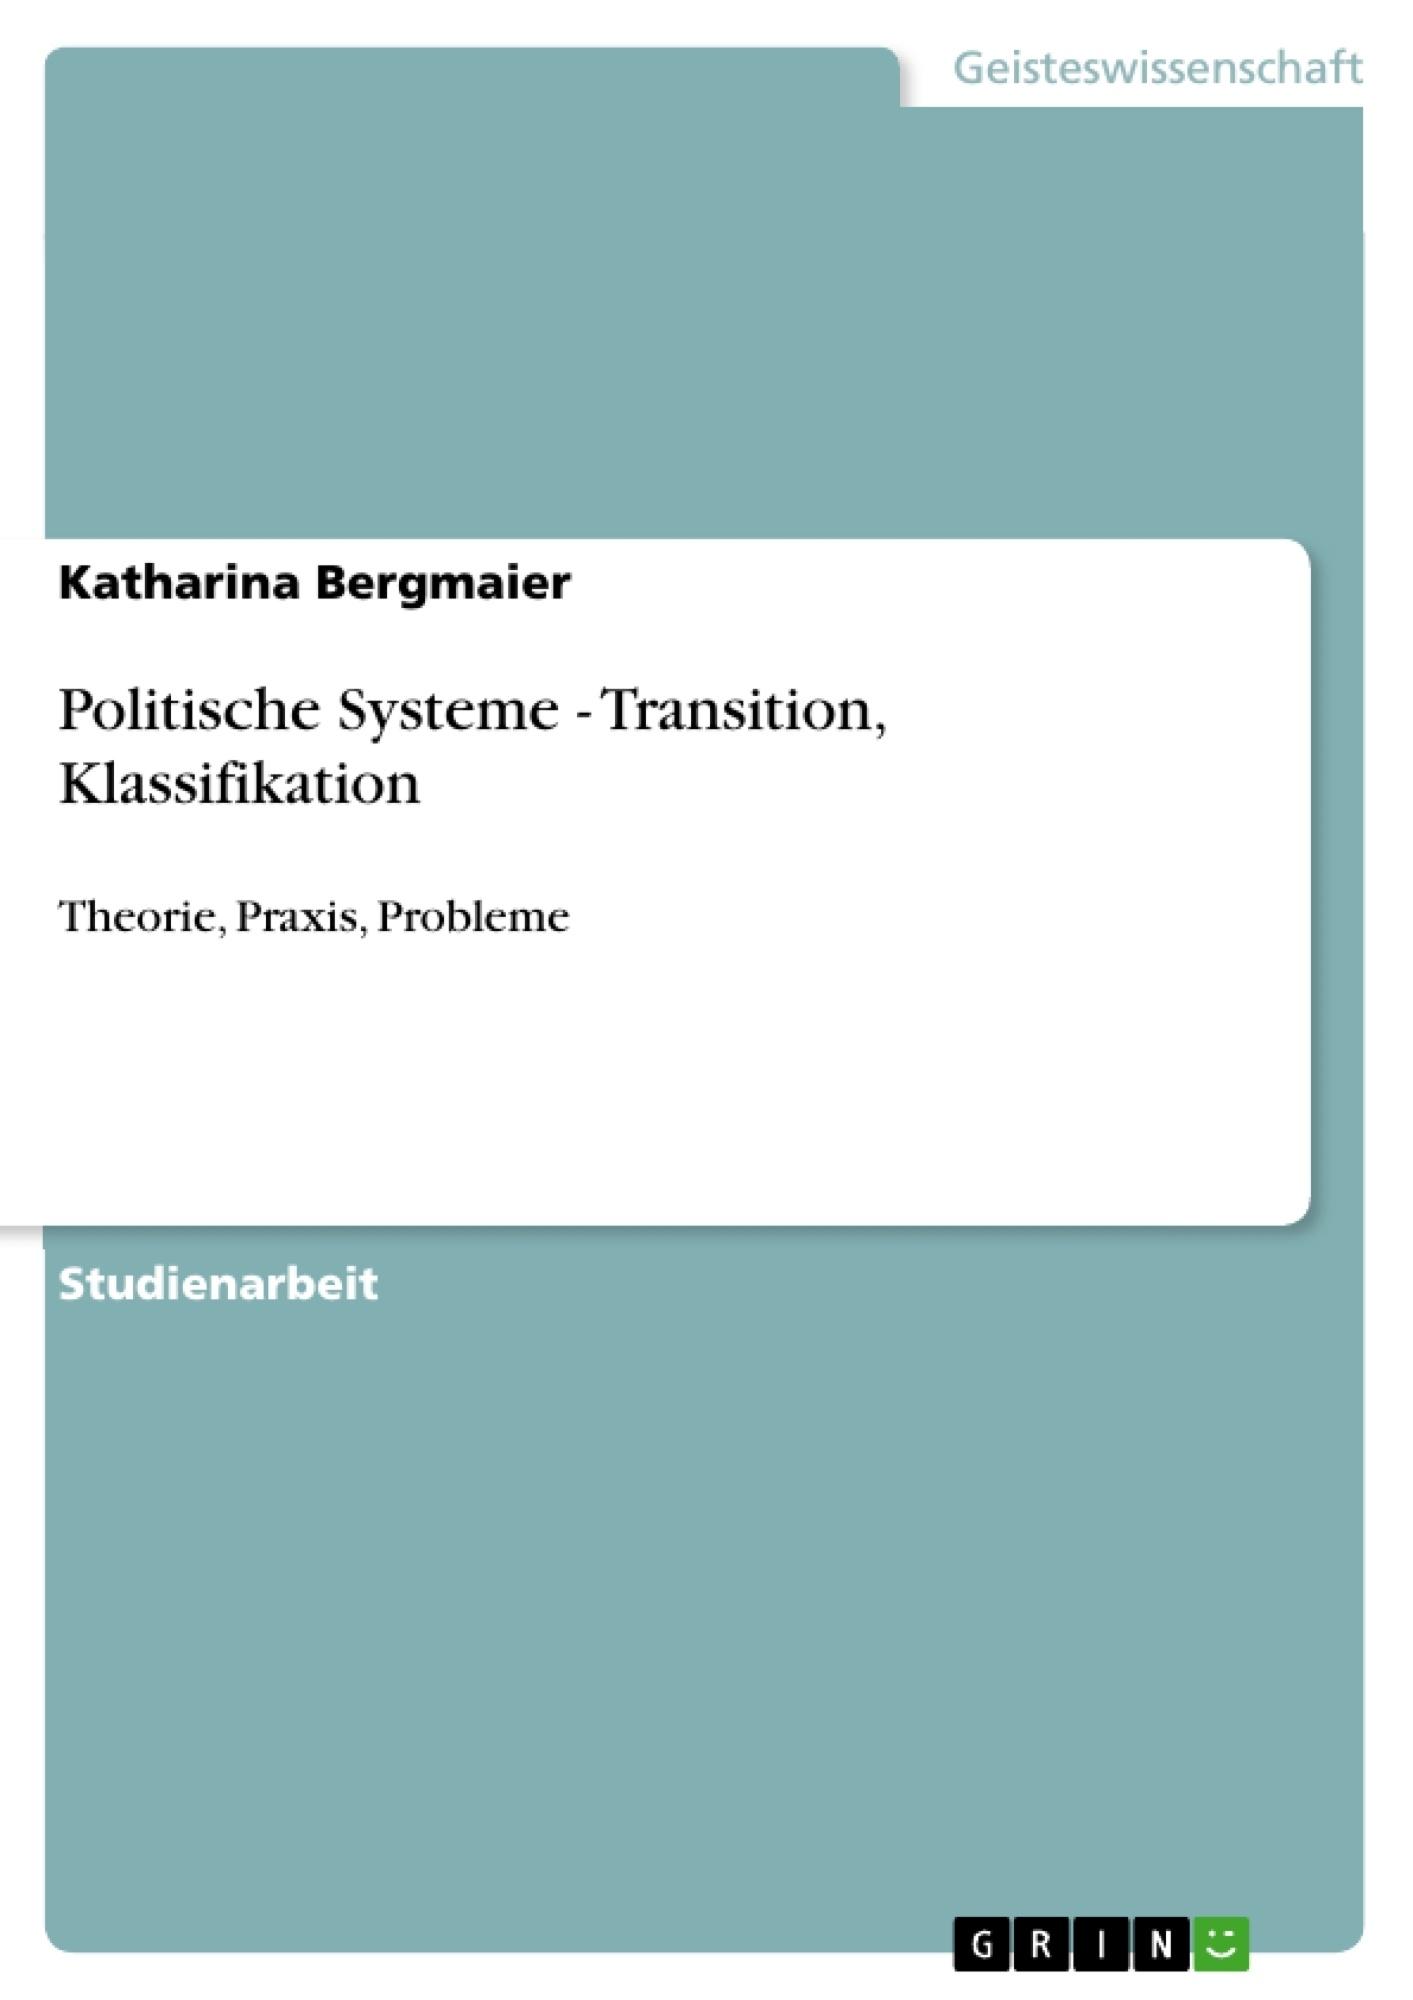 Titel: Politische Systeme - Transition, Klassifikation